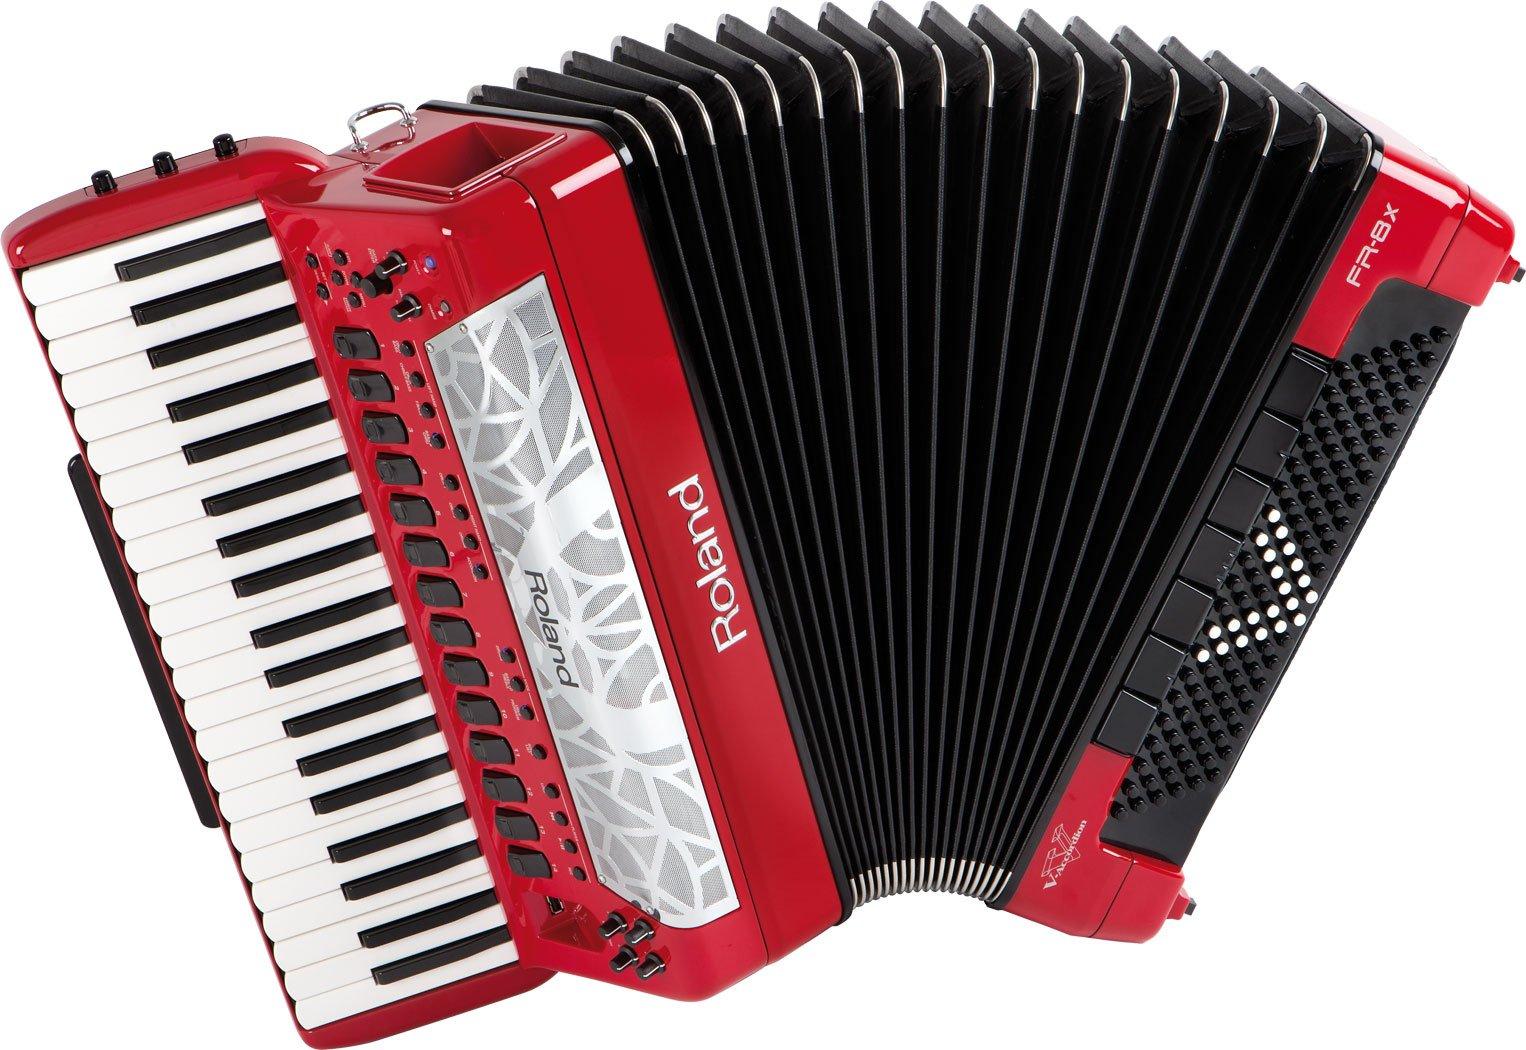 NEW Red Roland FR-8X-RD Digital Piano Accordion 41 120